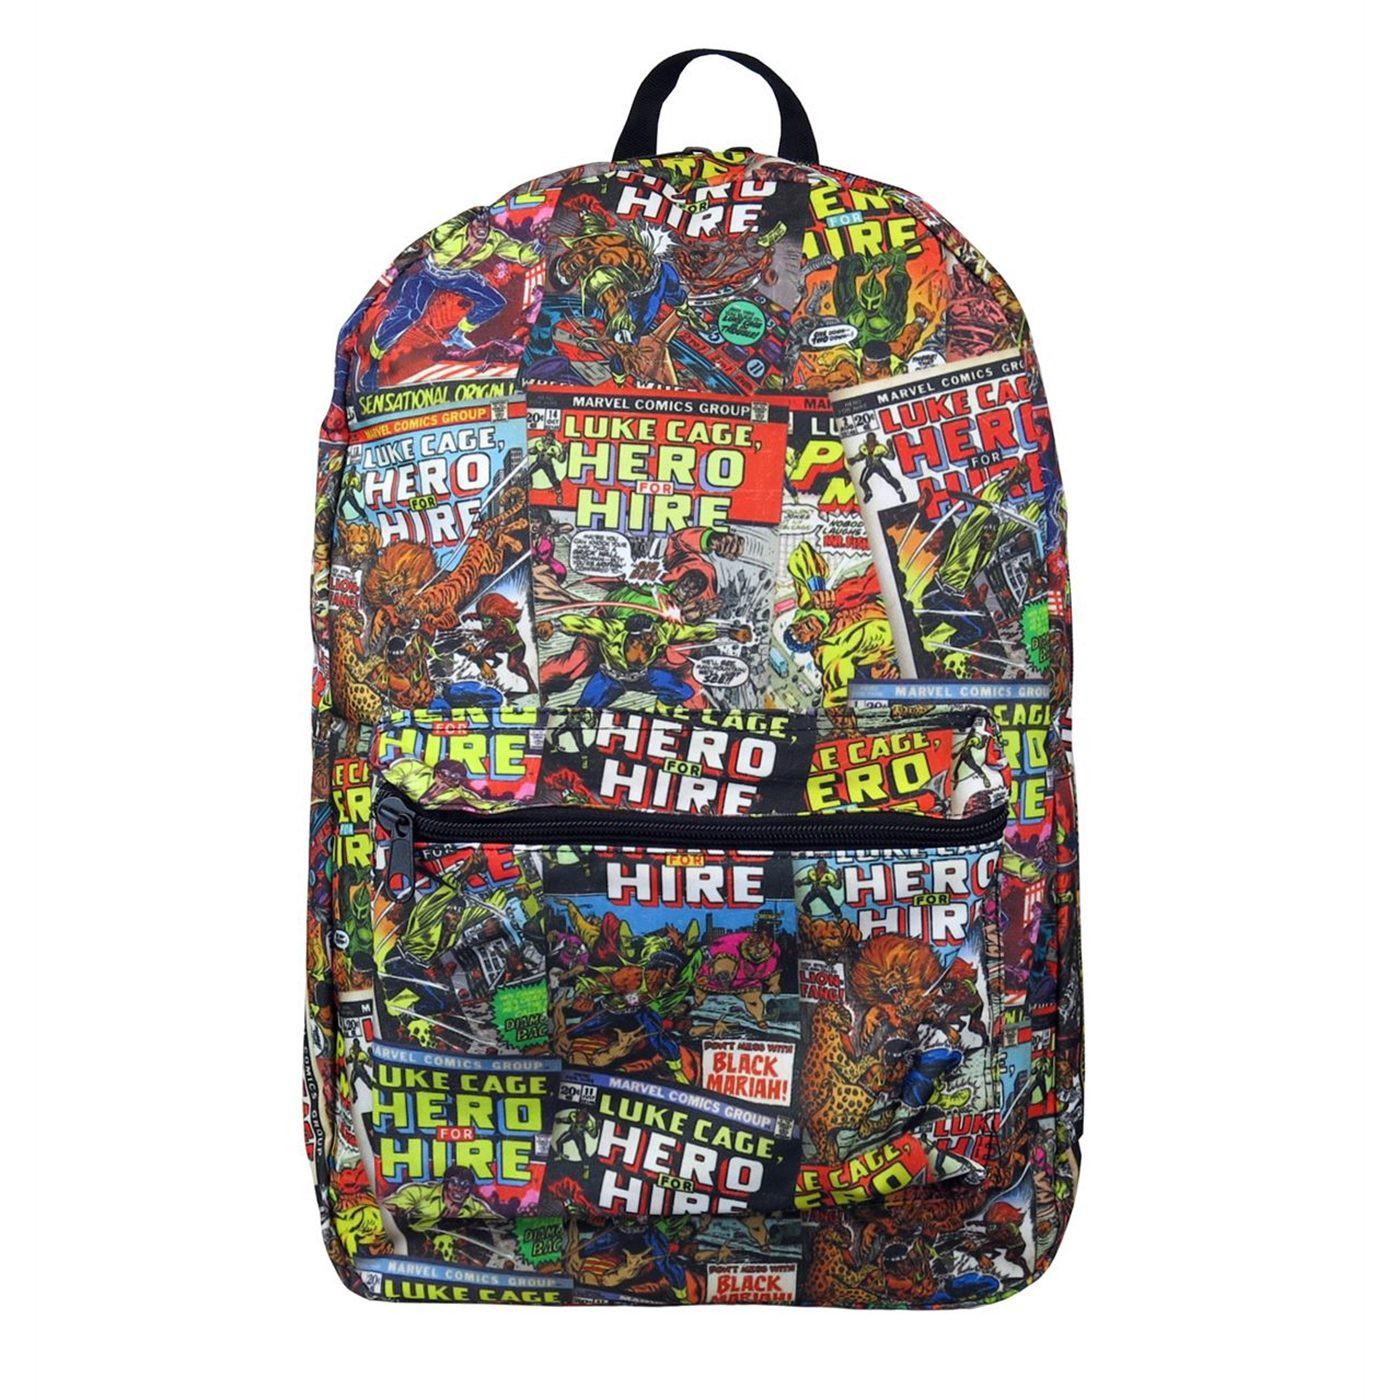 Luke Cage Comic Cover Mosaic Backpack